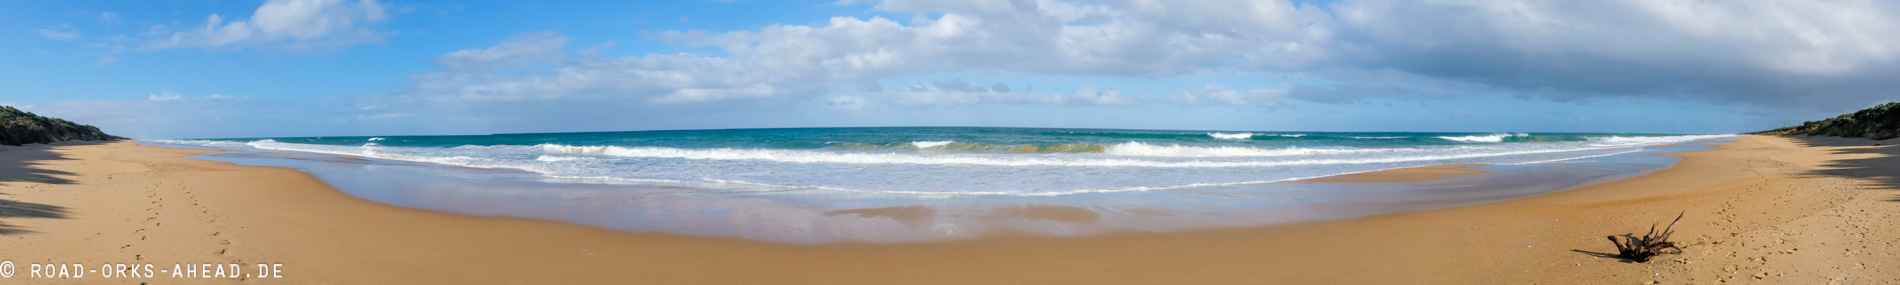 Ninety Mile Beach Panorama